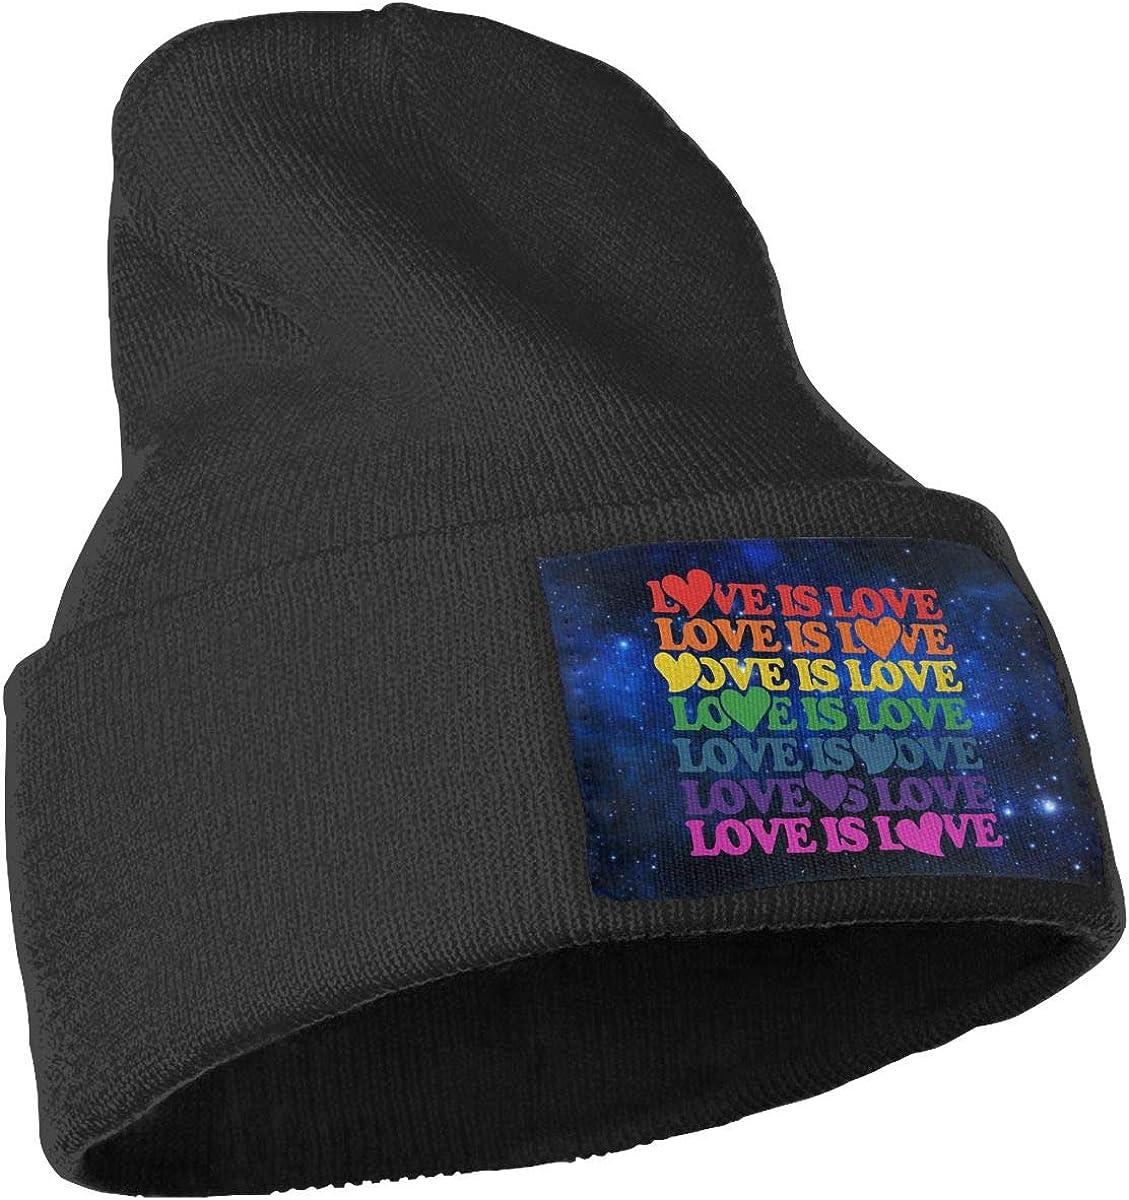 Men /& Women Love is Love Rainbow Outdoor Fashion Knit Beanies Hat Soft Winter Knit Caps